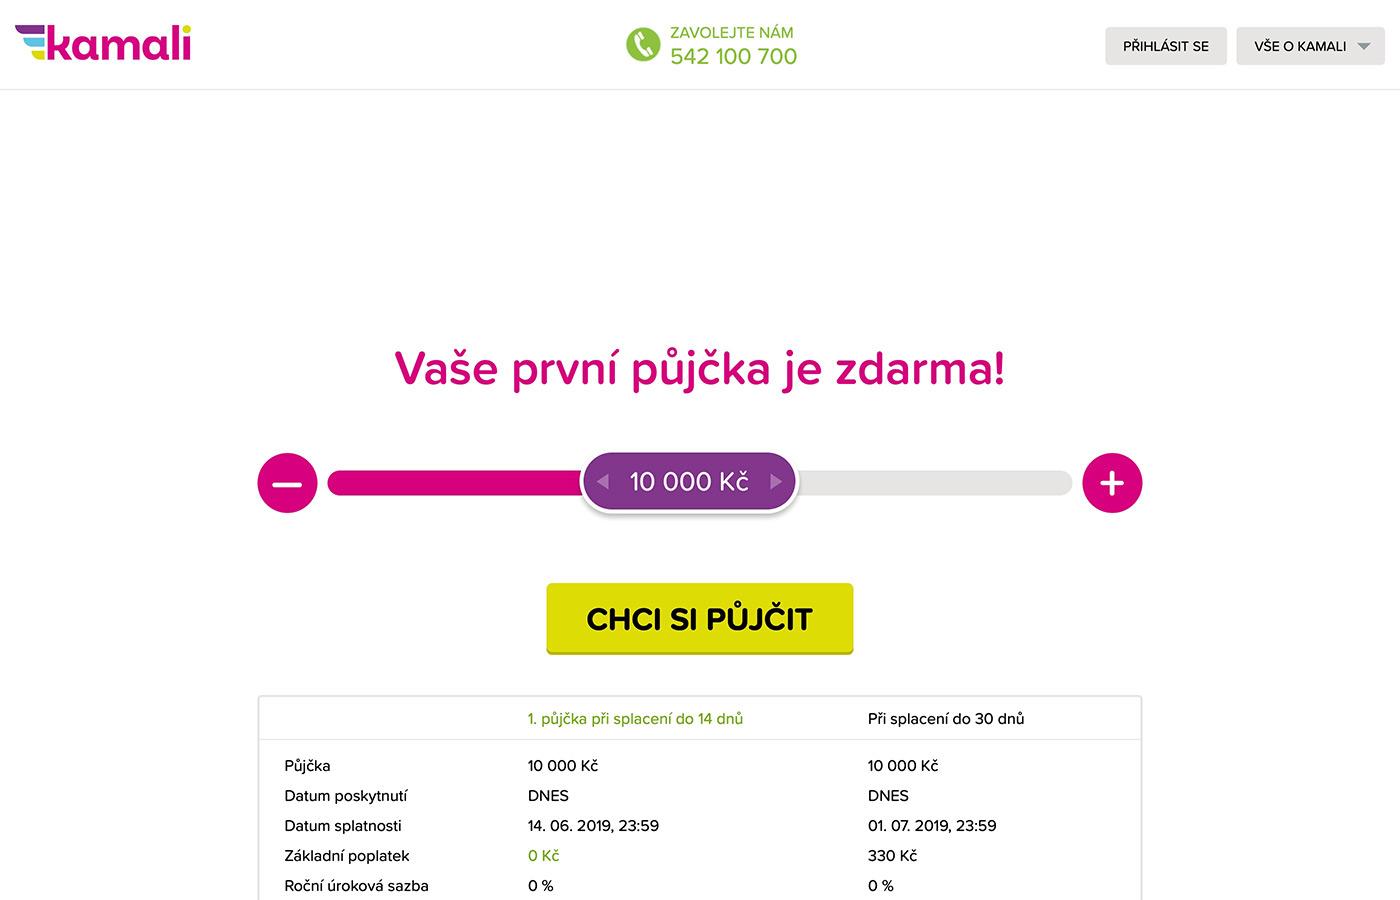 Webové stránky https://www.kamali.cz